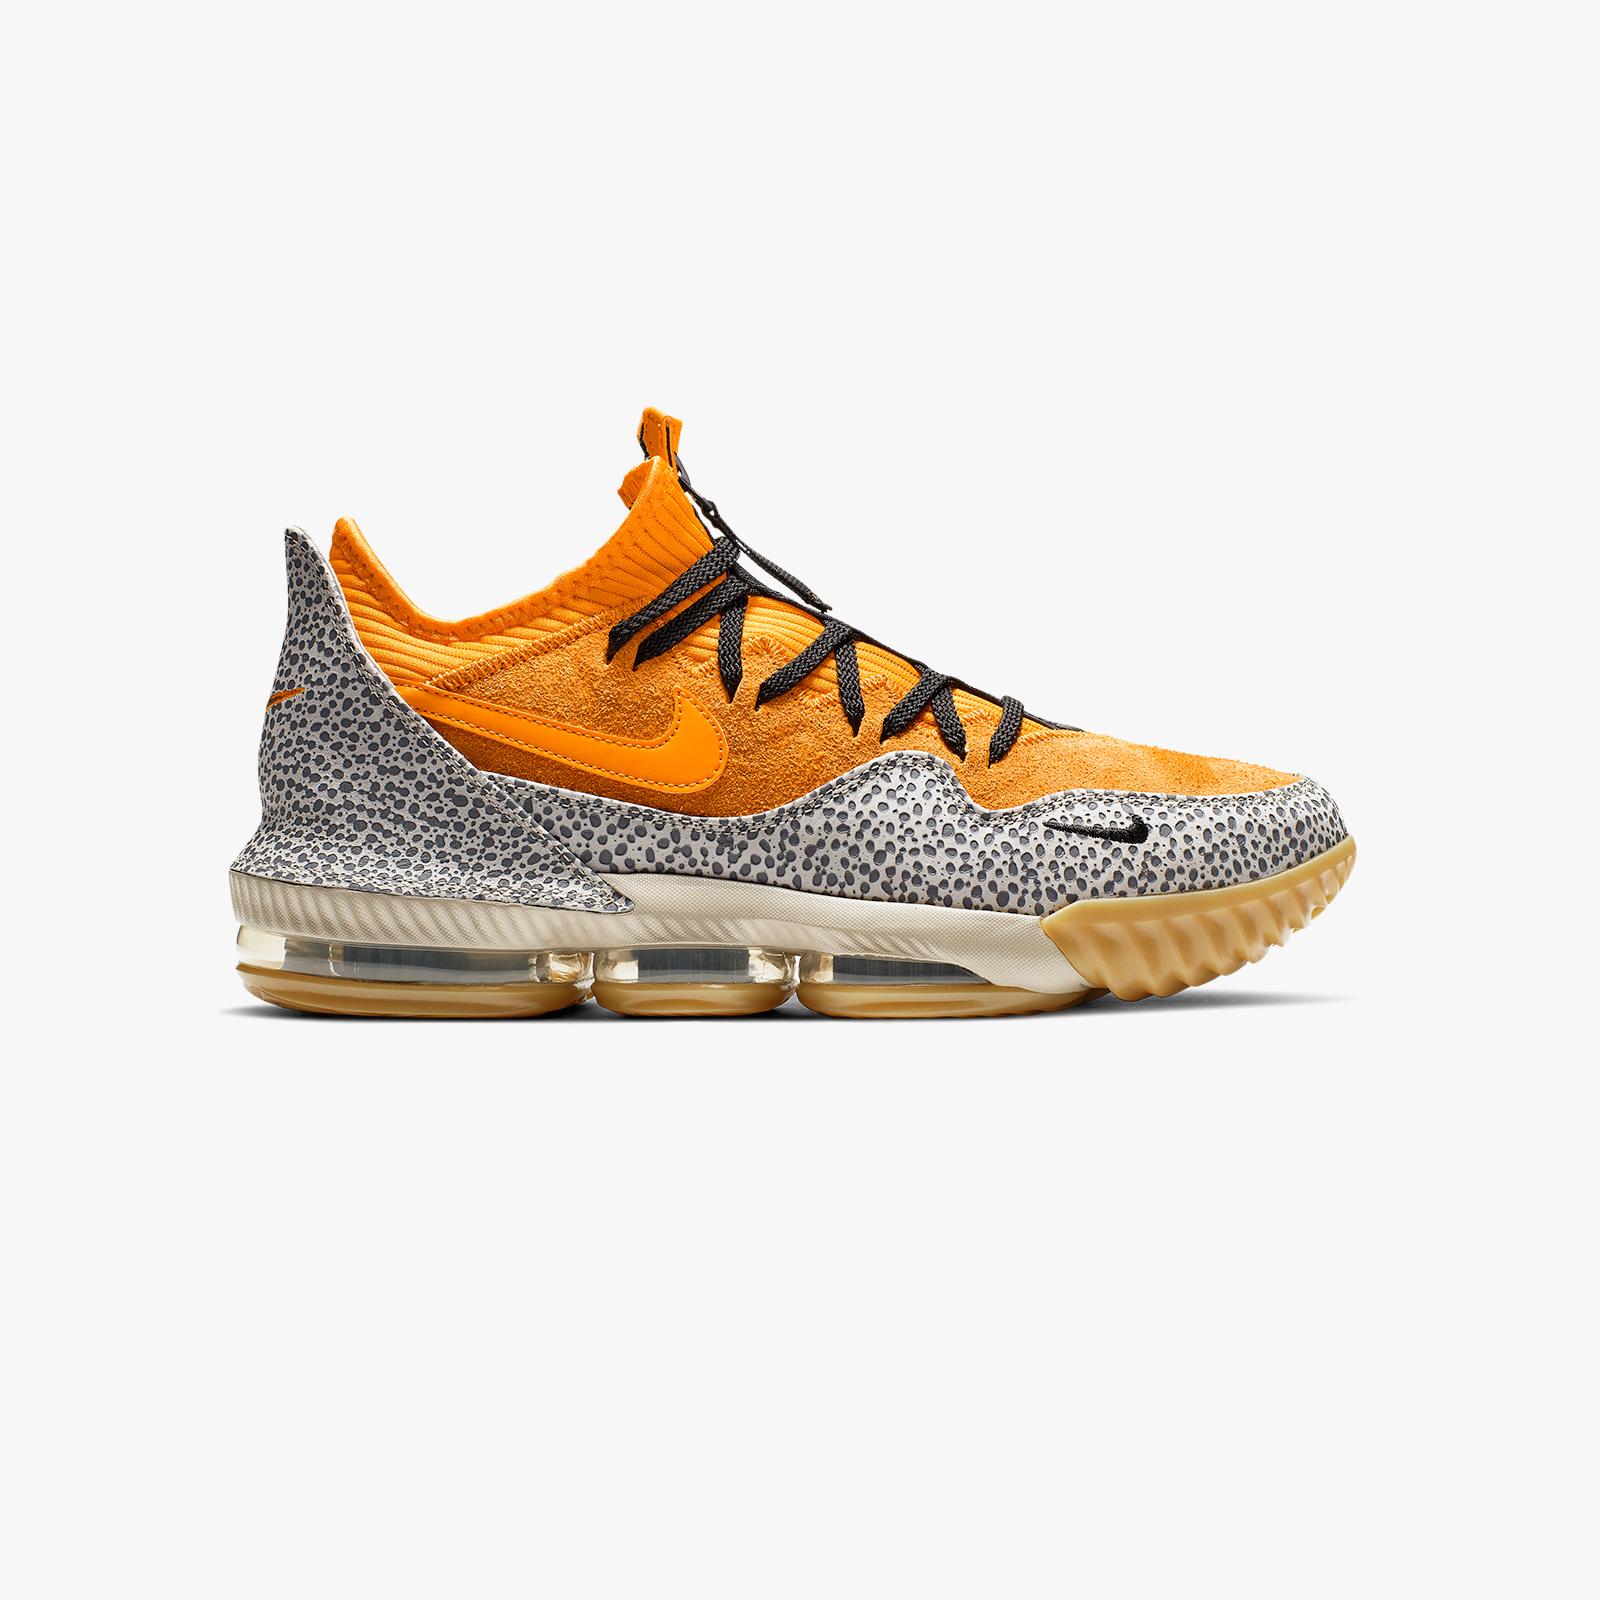 Nike LeBron XVI Low AC - Cd9471-800